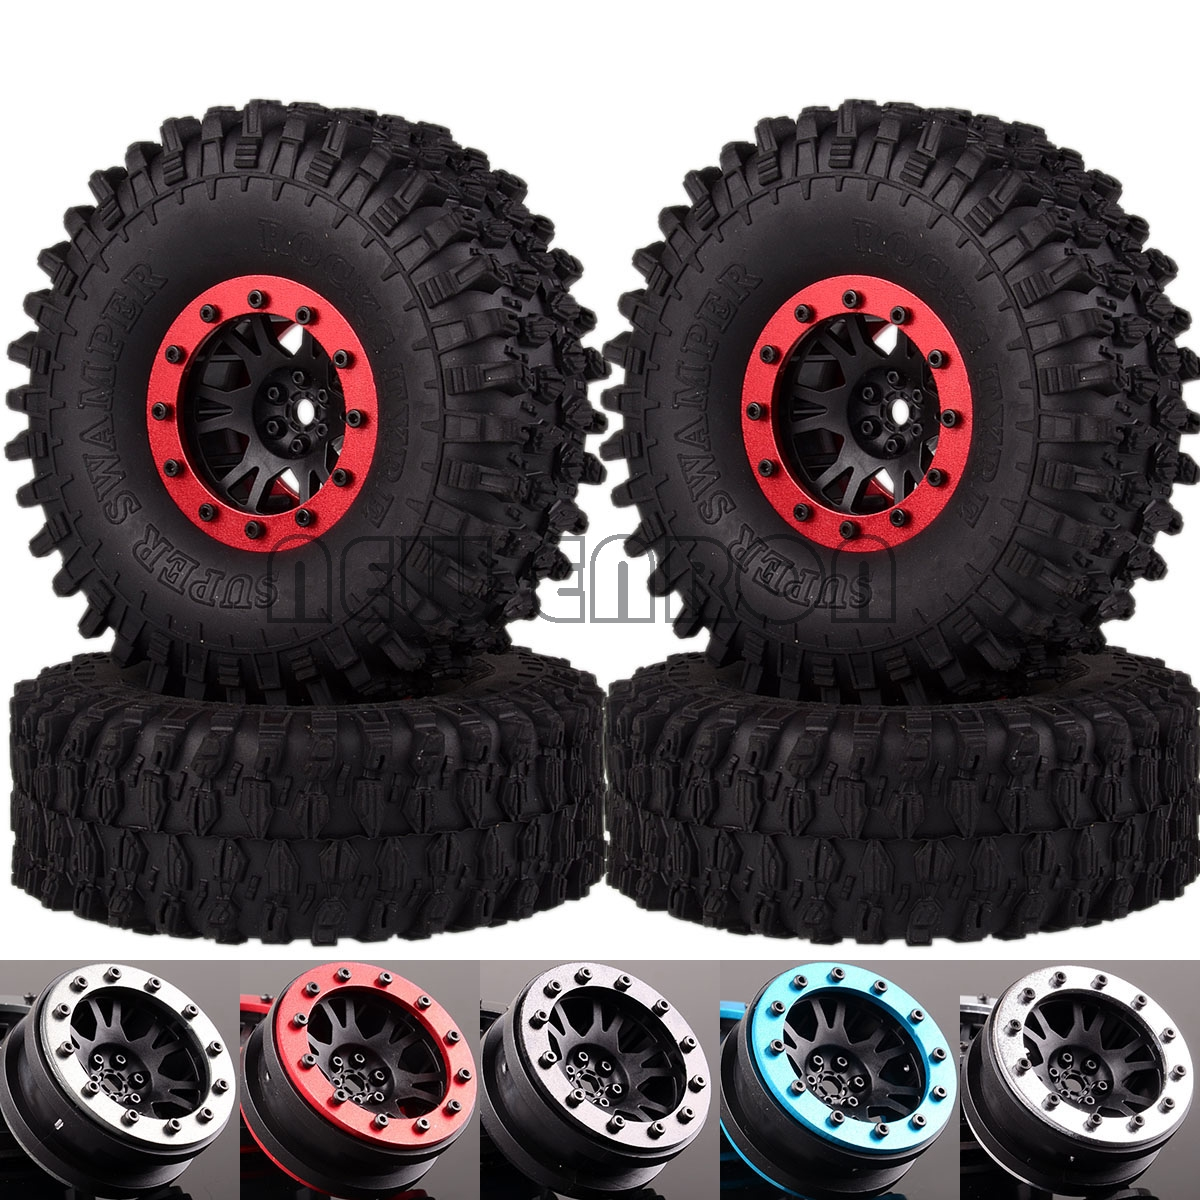 "NEW ENRON 4P 1.9"" Beadlock Wheel Rims 120MM Tires Tyre For RC 1/10 Crawler TRX-4 Tamiya CC01 MST jimny RC4WD TF2 D90 D110 90046(China)"